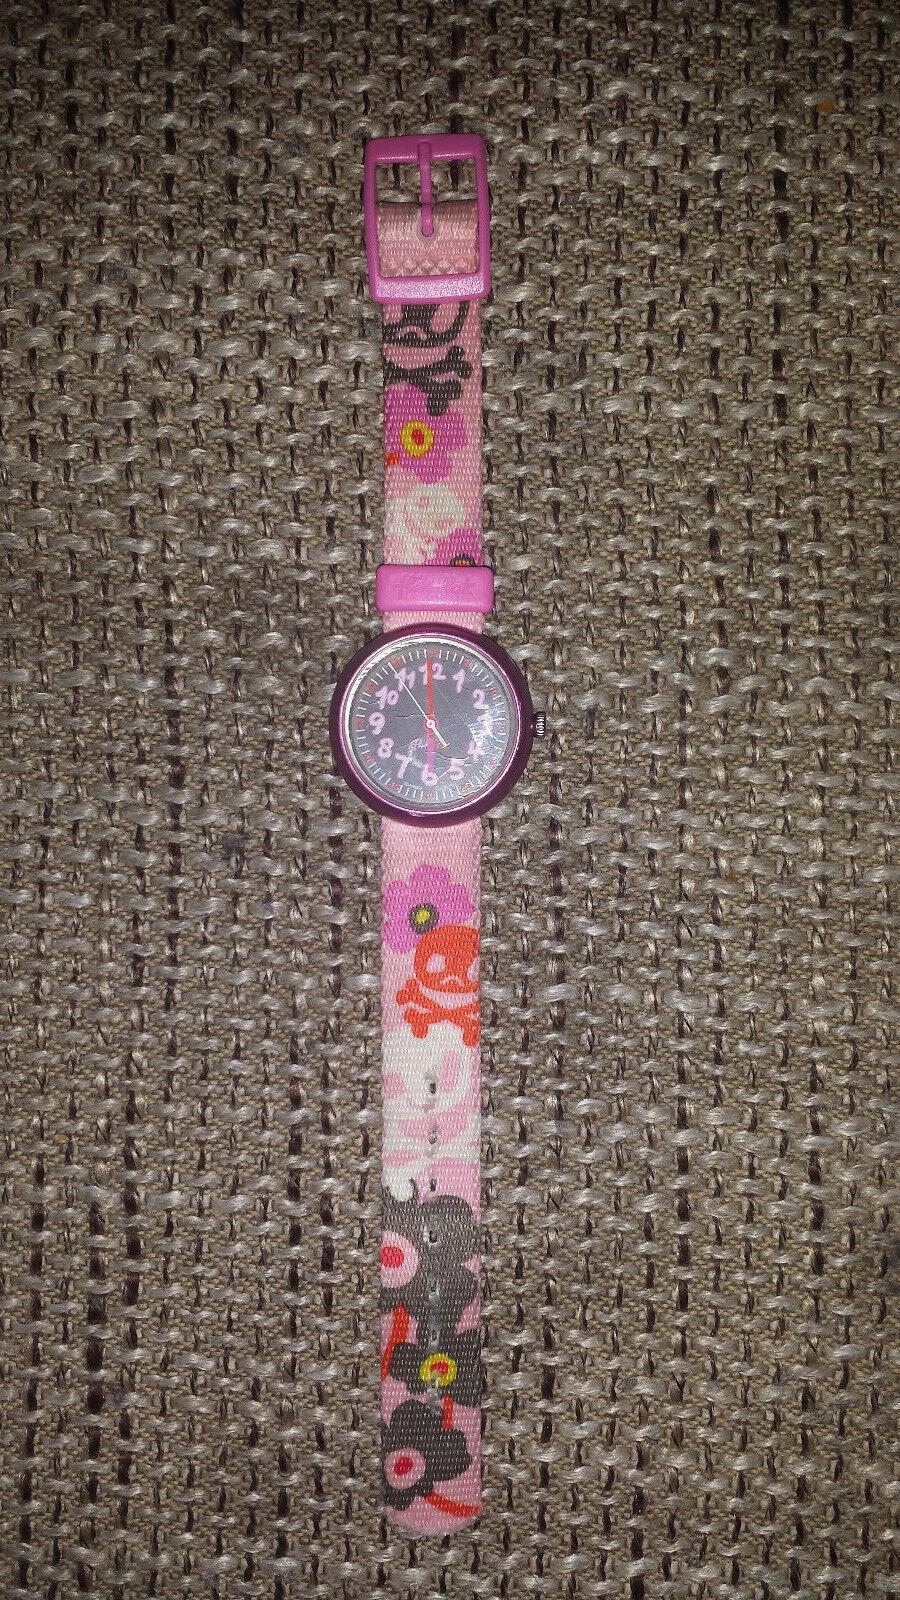 ☆ flik flak Uhr Armbanduhr Mädchen Skull Totenkopf für Schulanfang ☆